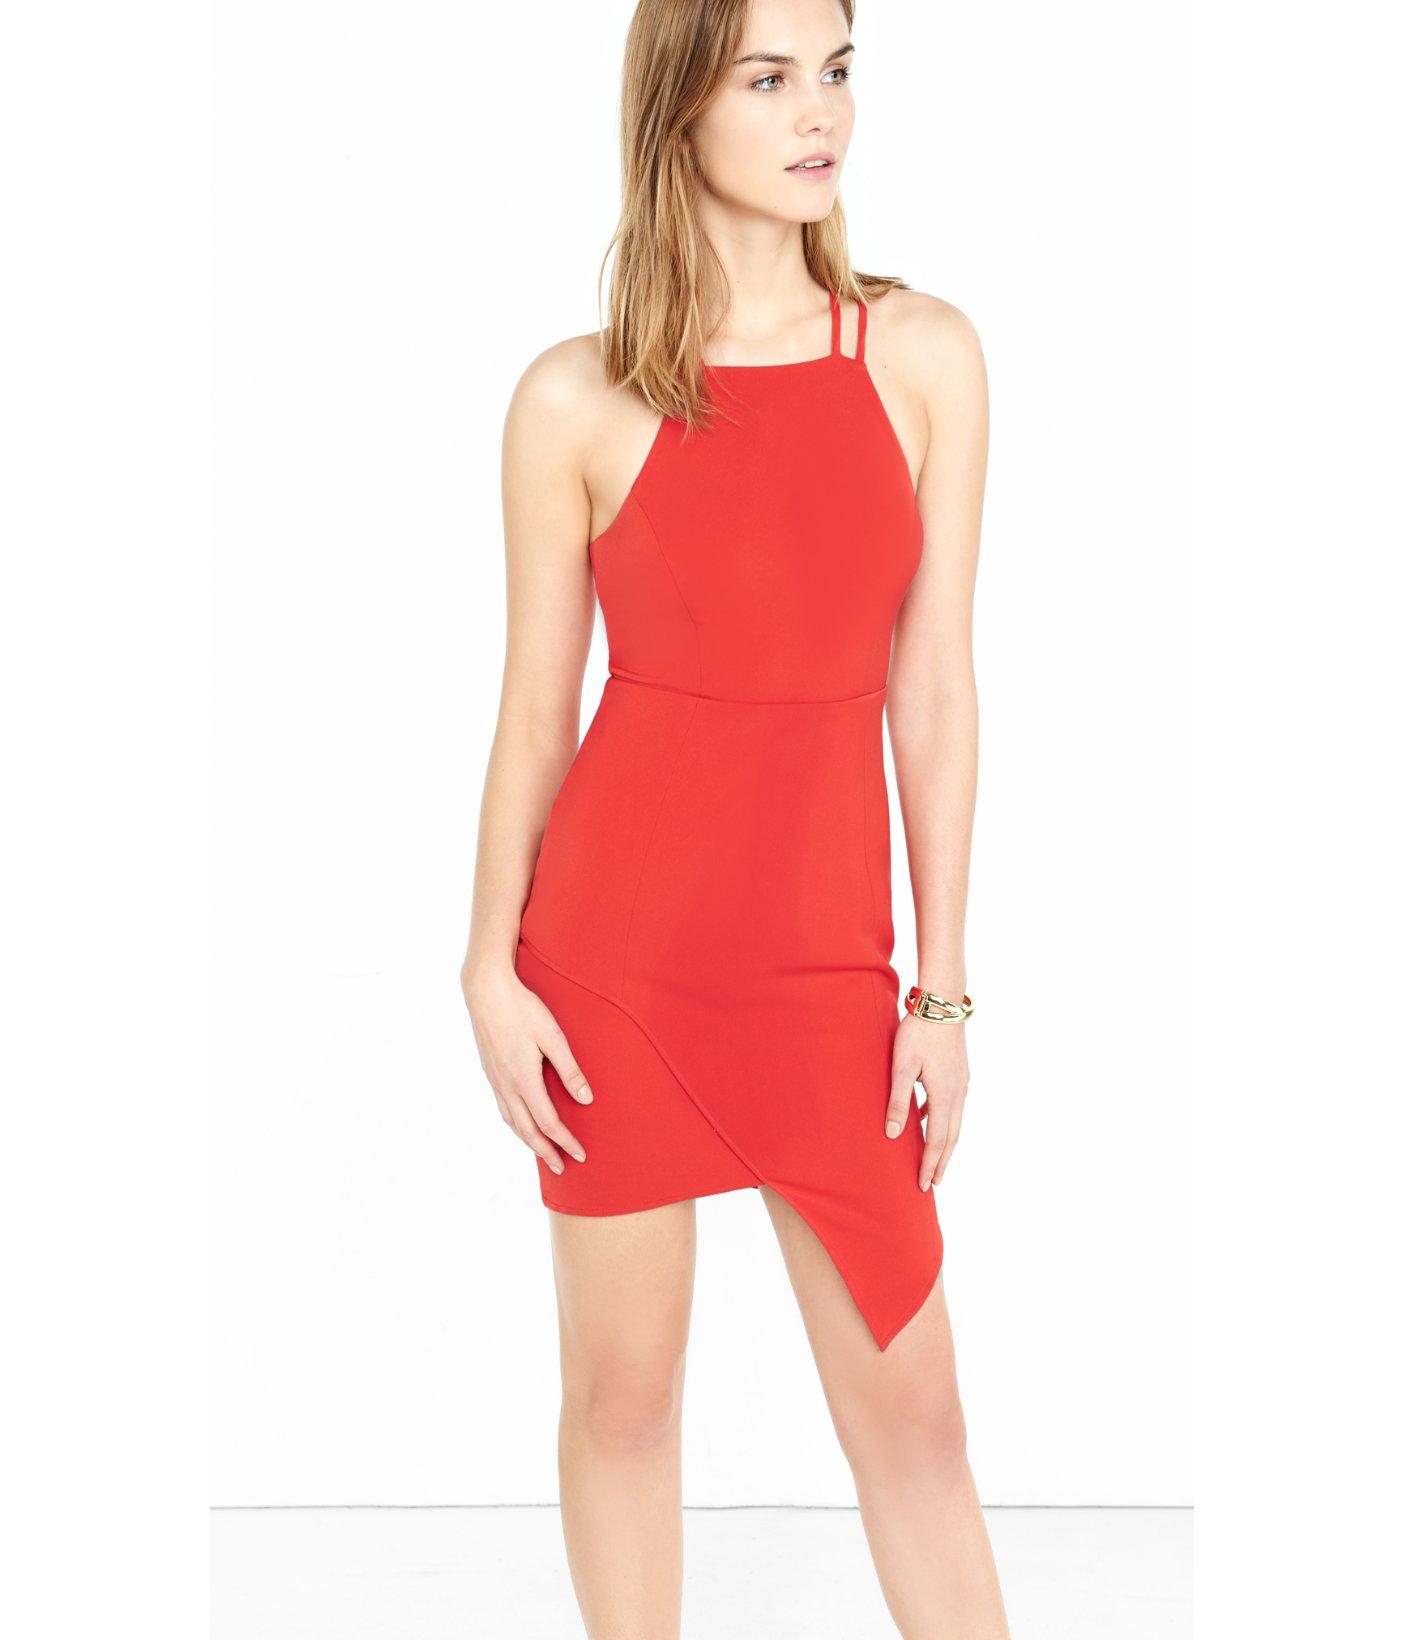 Express Red Strappy Asymmetrical Hem Sheath Dress in Red - Lyst